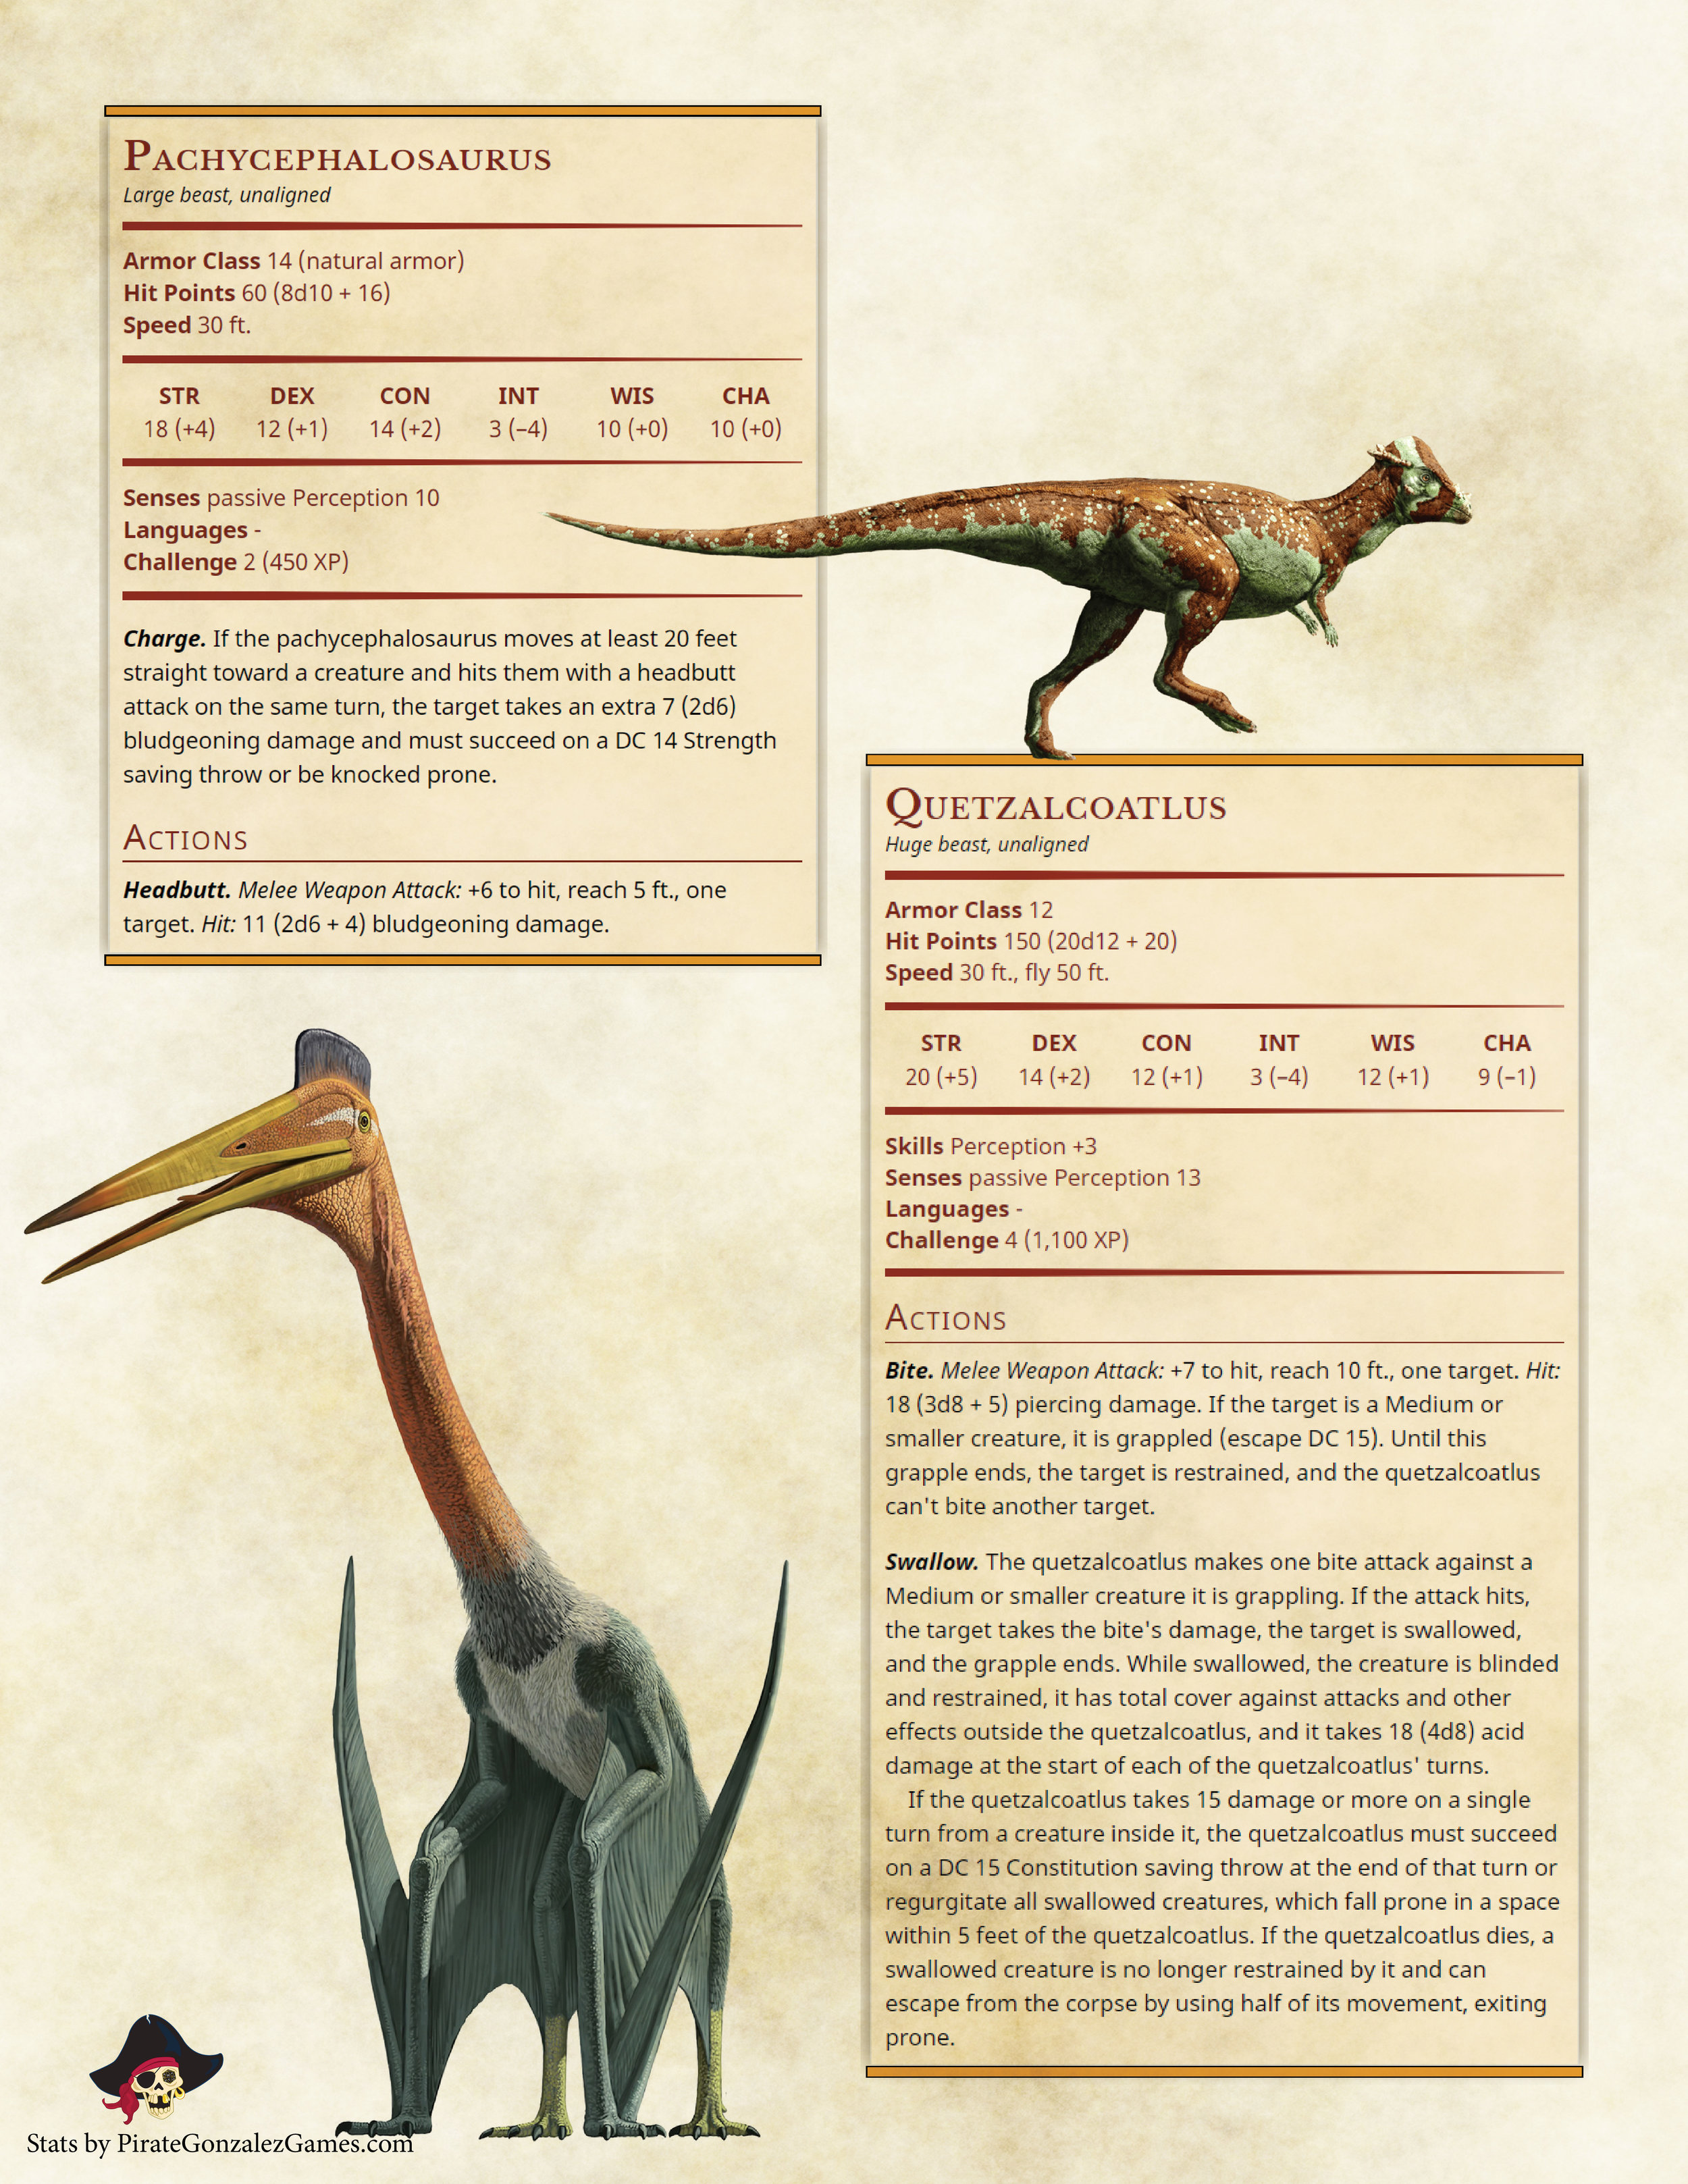 Pachycephalosaurus, Quetzalcoatlus